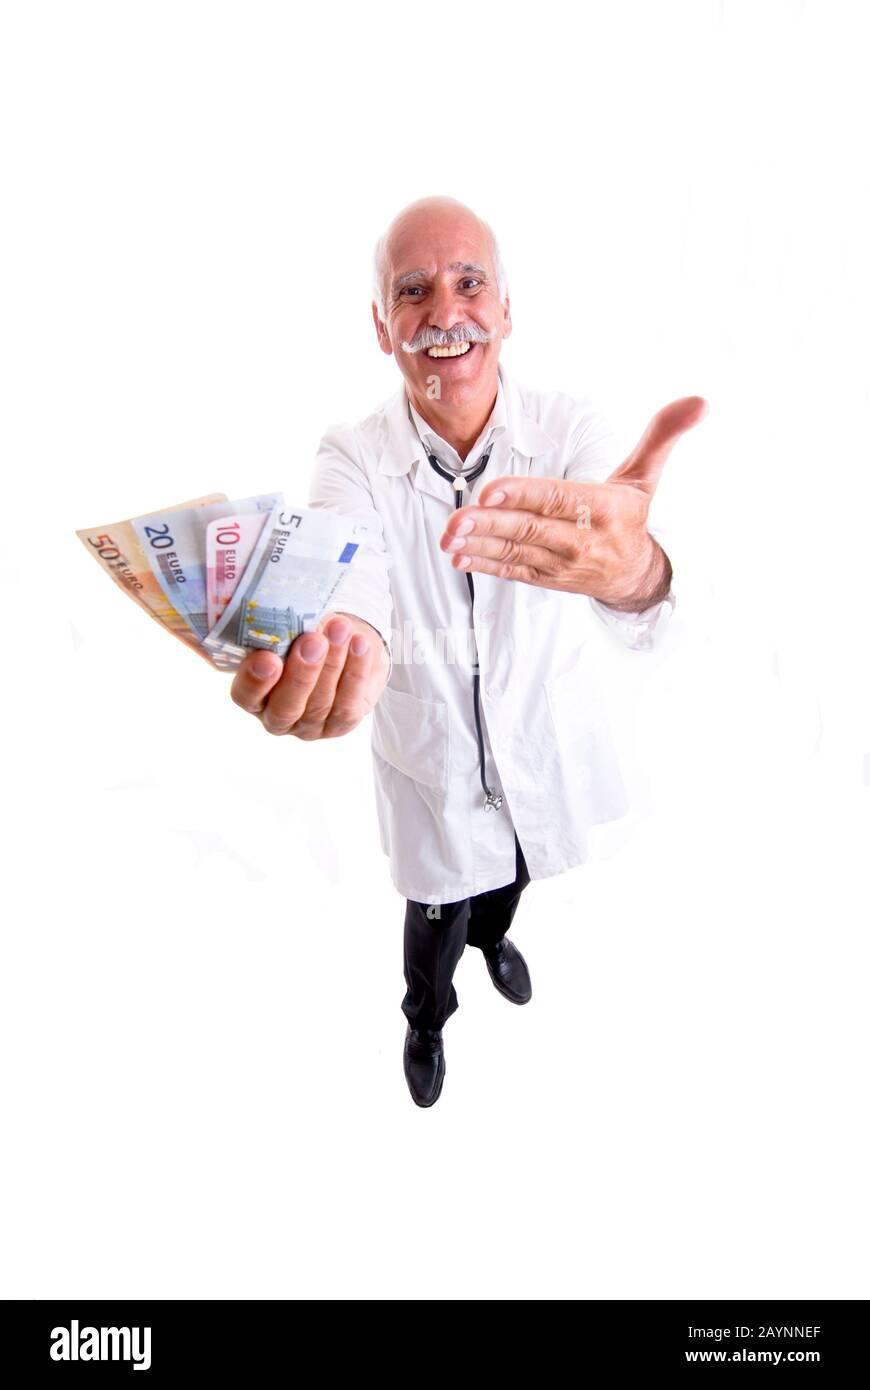 Gesundheitsreform Stock Photo